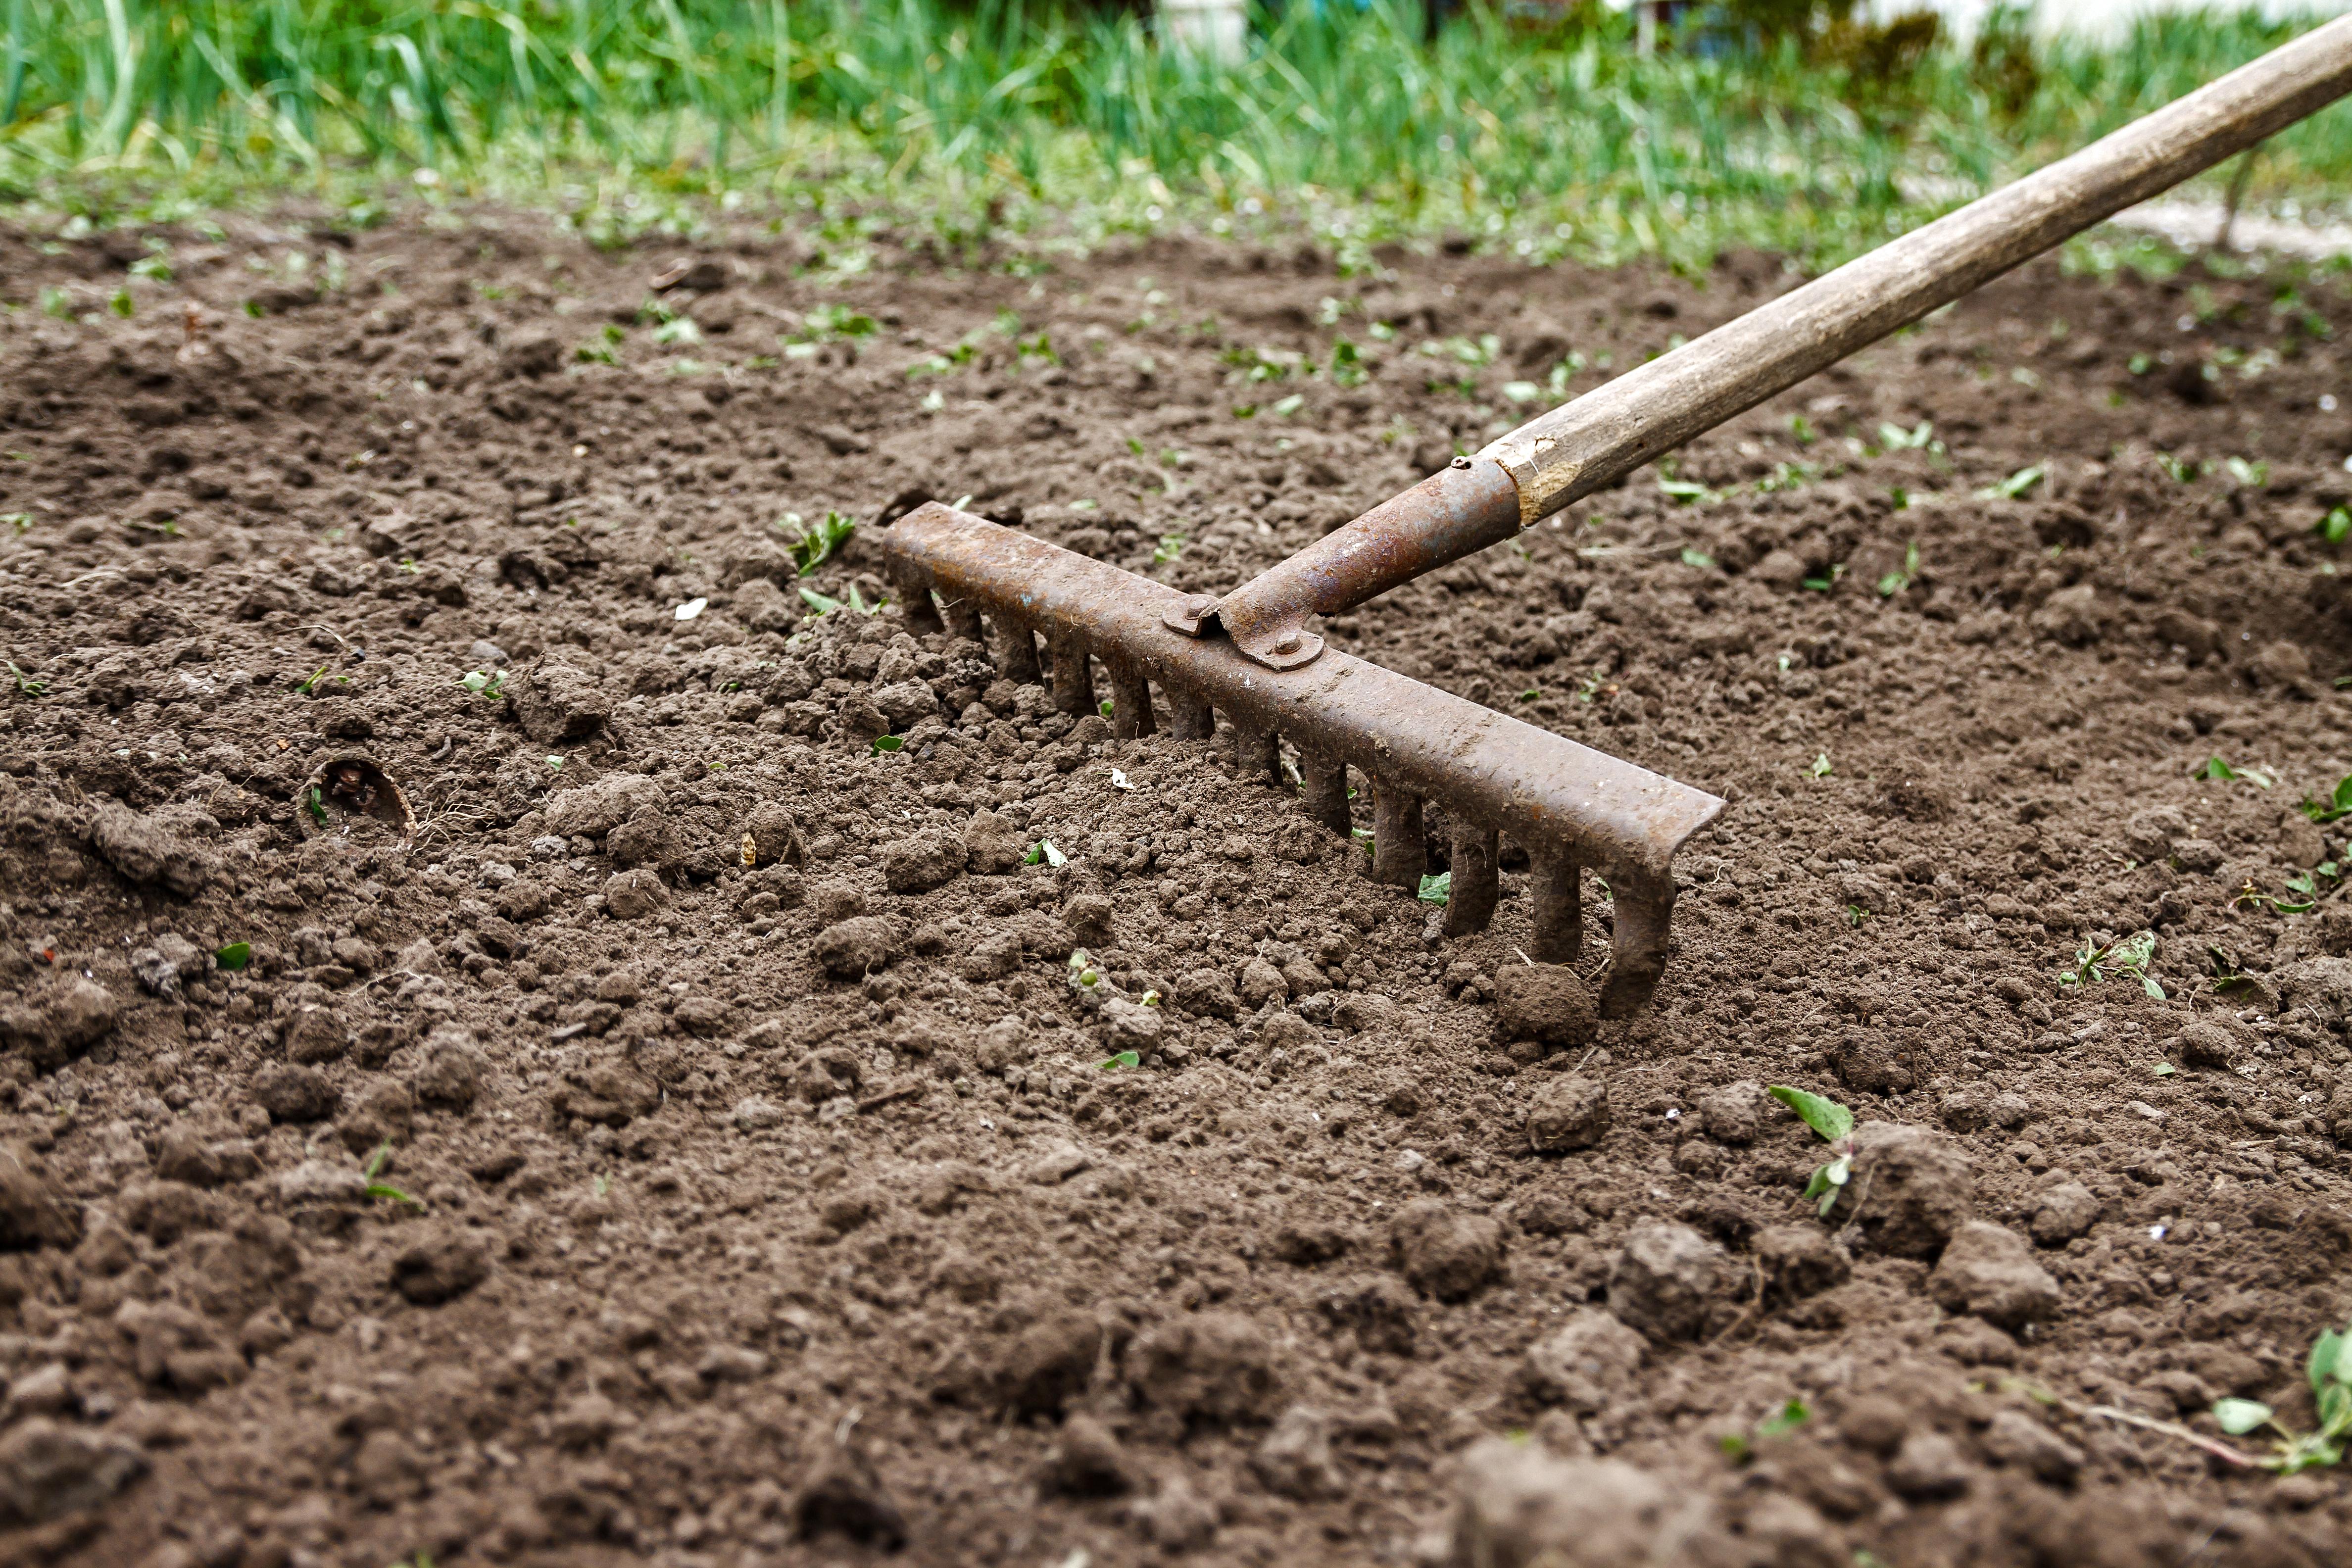 How to Eliminate White Fungus From Garden Soil